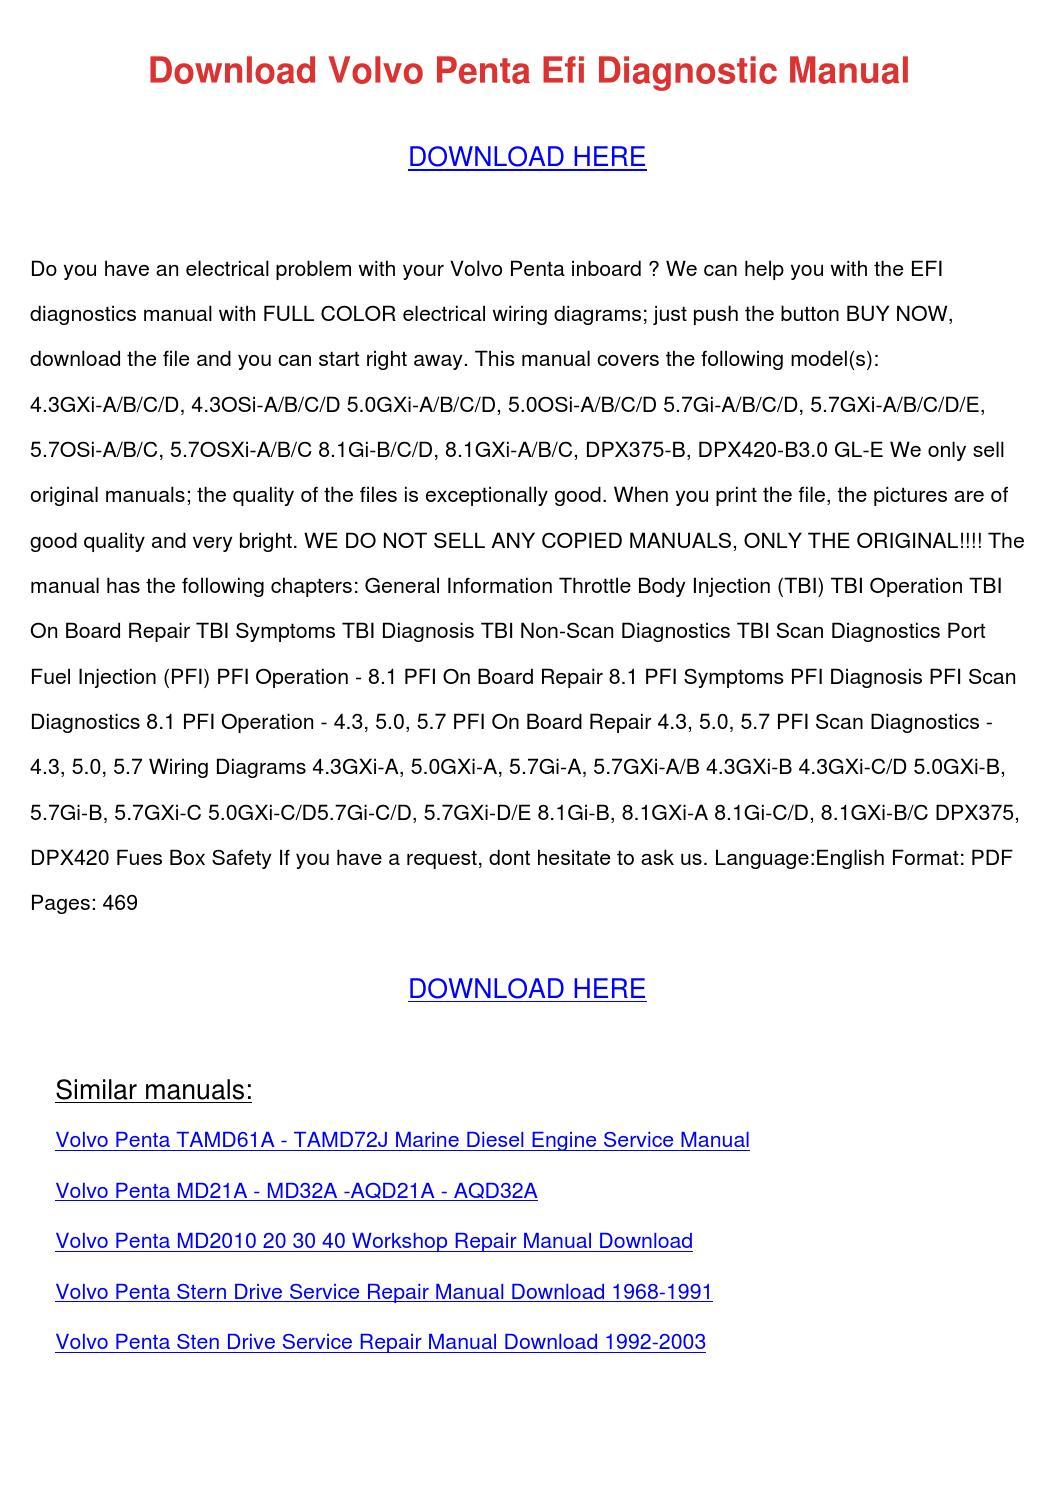 hight resolution of download volvo penta efi diagnostic manual by edmundcyr issuu 5 0 gxi wiring diagram